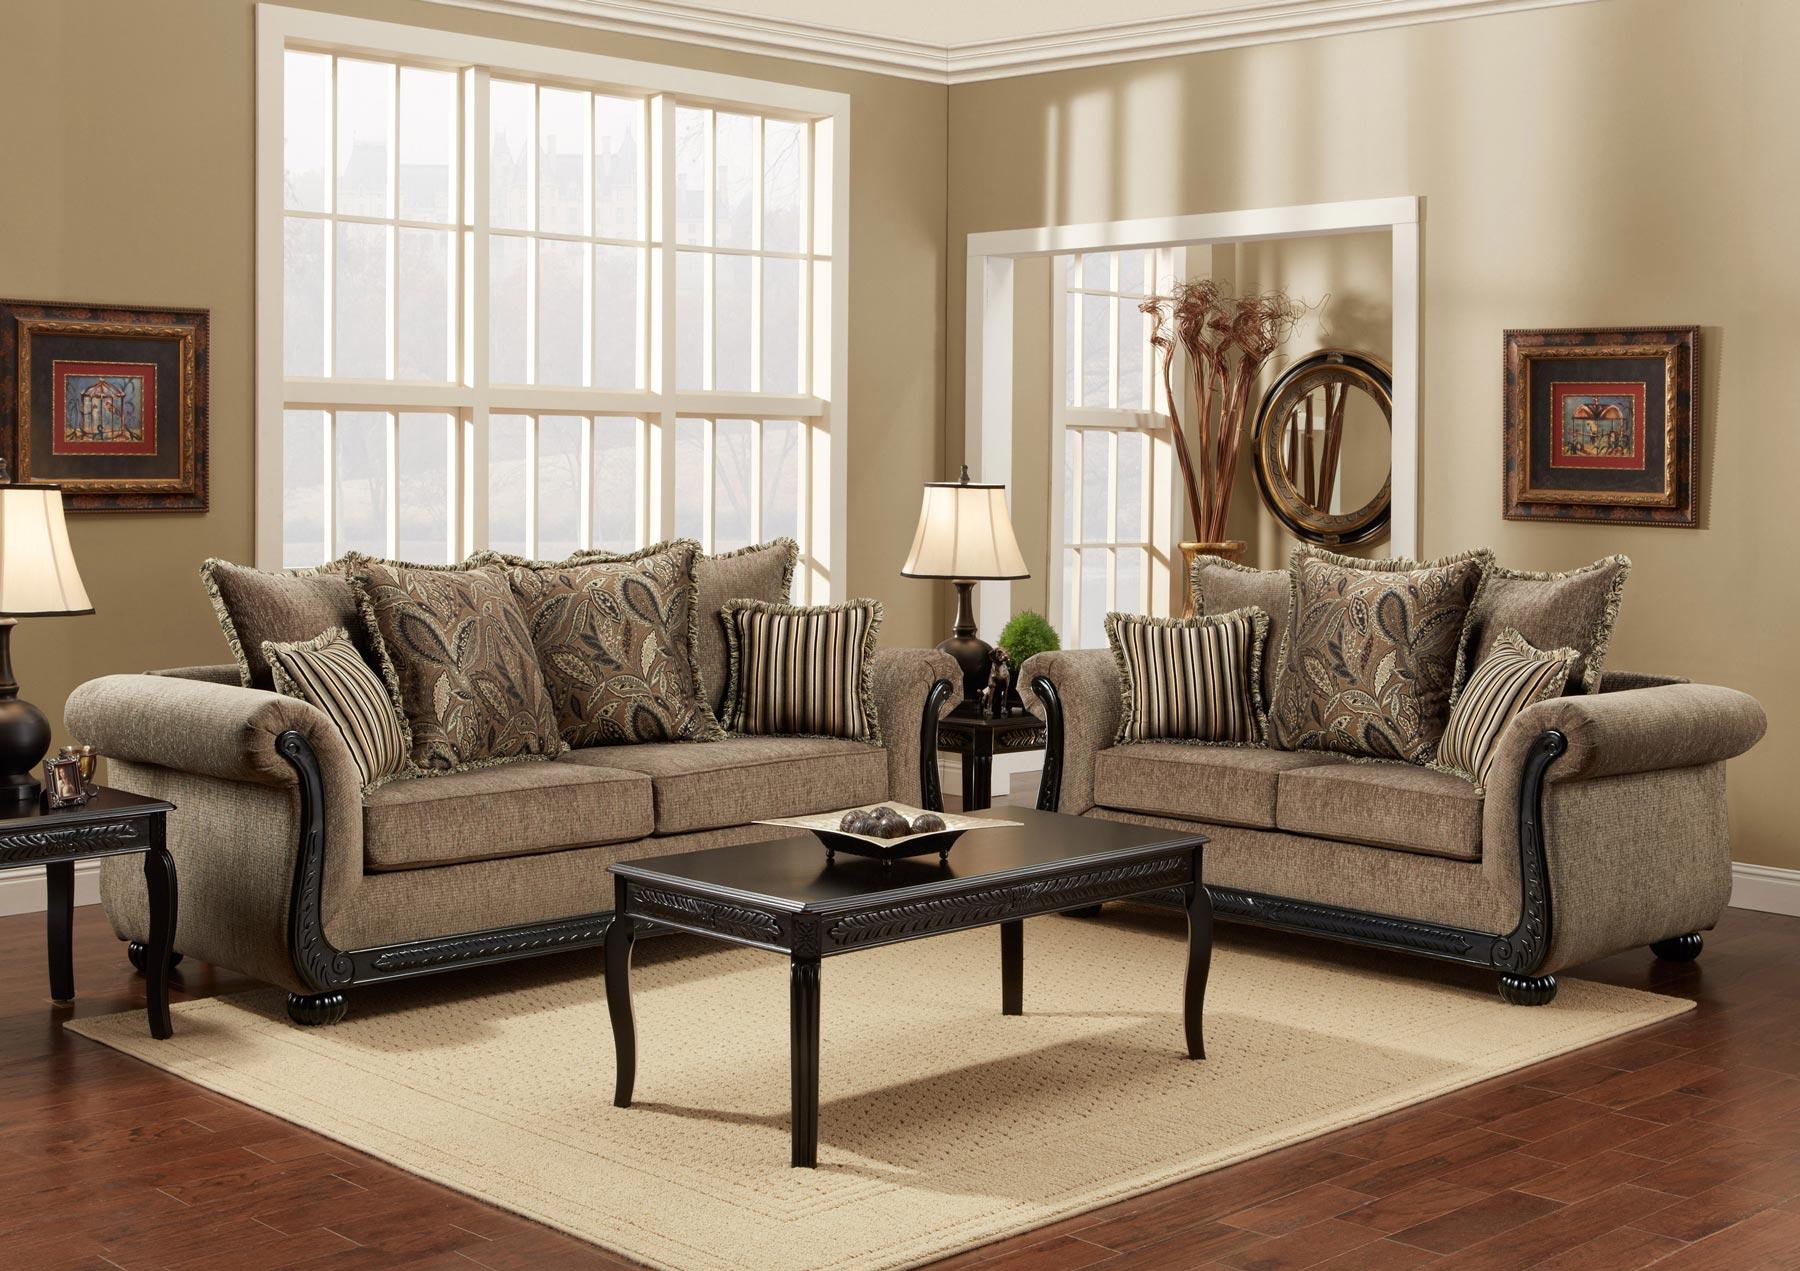 Dream Java 2 Piece Furniture Set